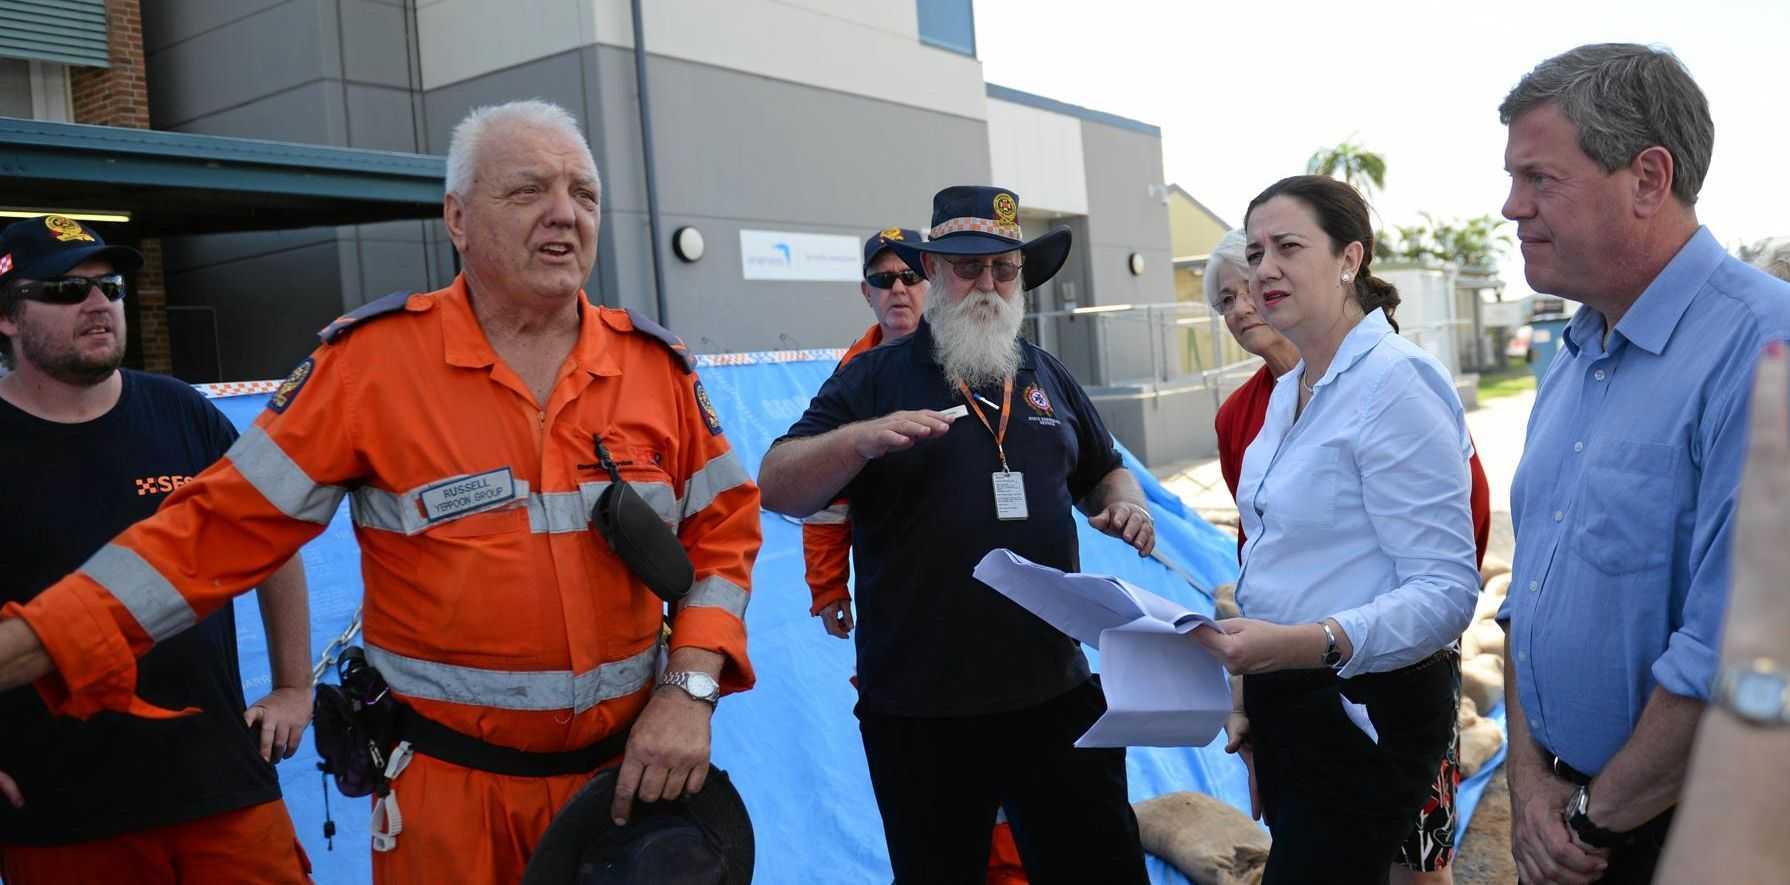 Qld Premier Annastacia Palaszczuk speak a SES volunteer at Rockhampton Airport.